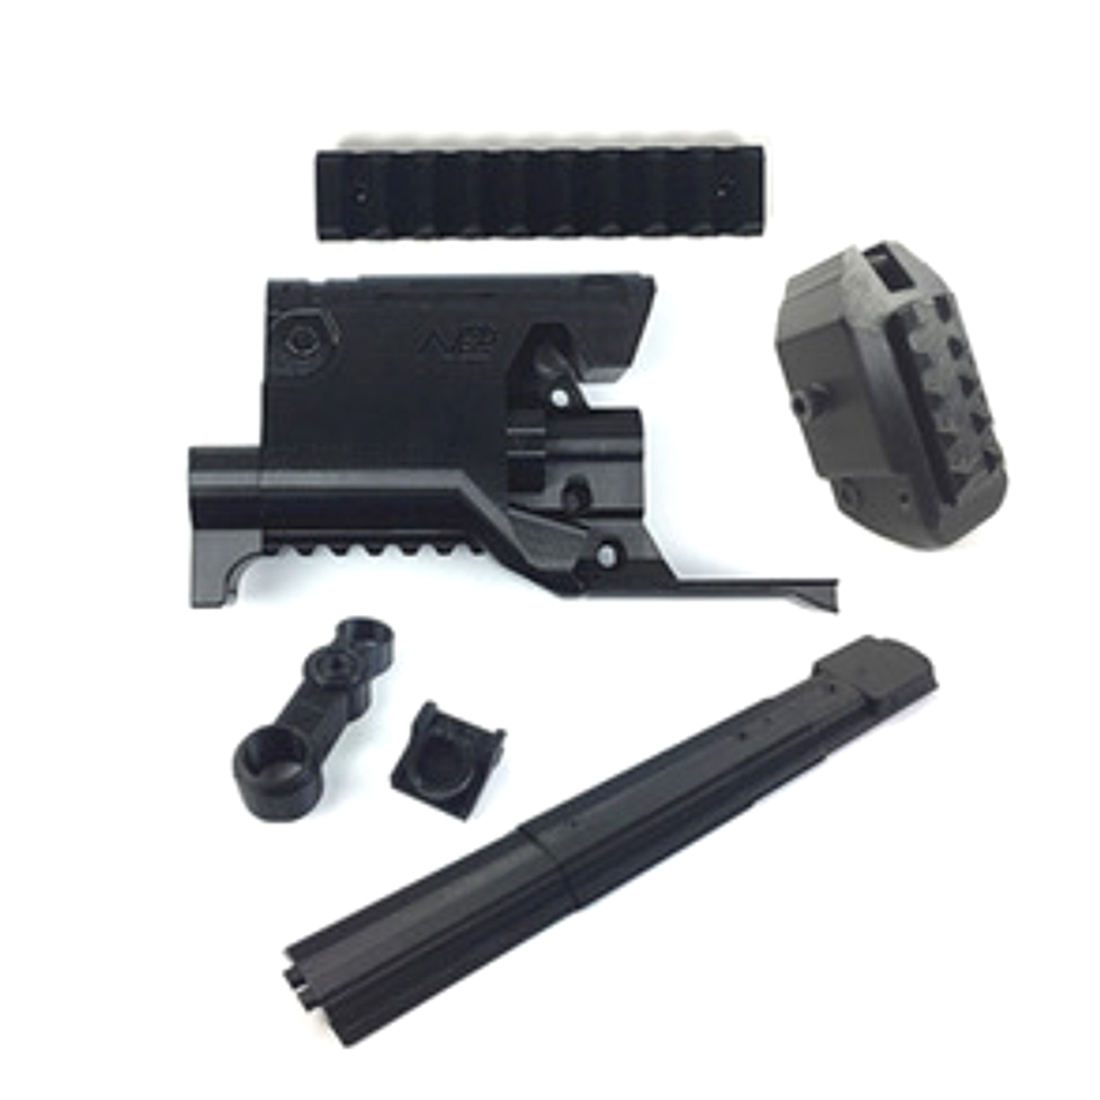 купить 3D Printing Type K and Type A Appearence Modified Kit for Nerf A0711 N-Strike Elite Stryfe Blaster - Black по цене 3345.48 рублей